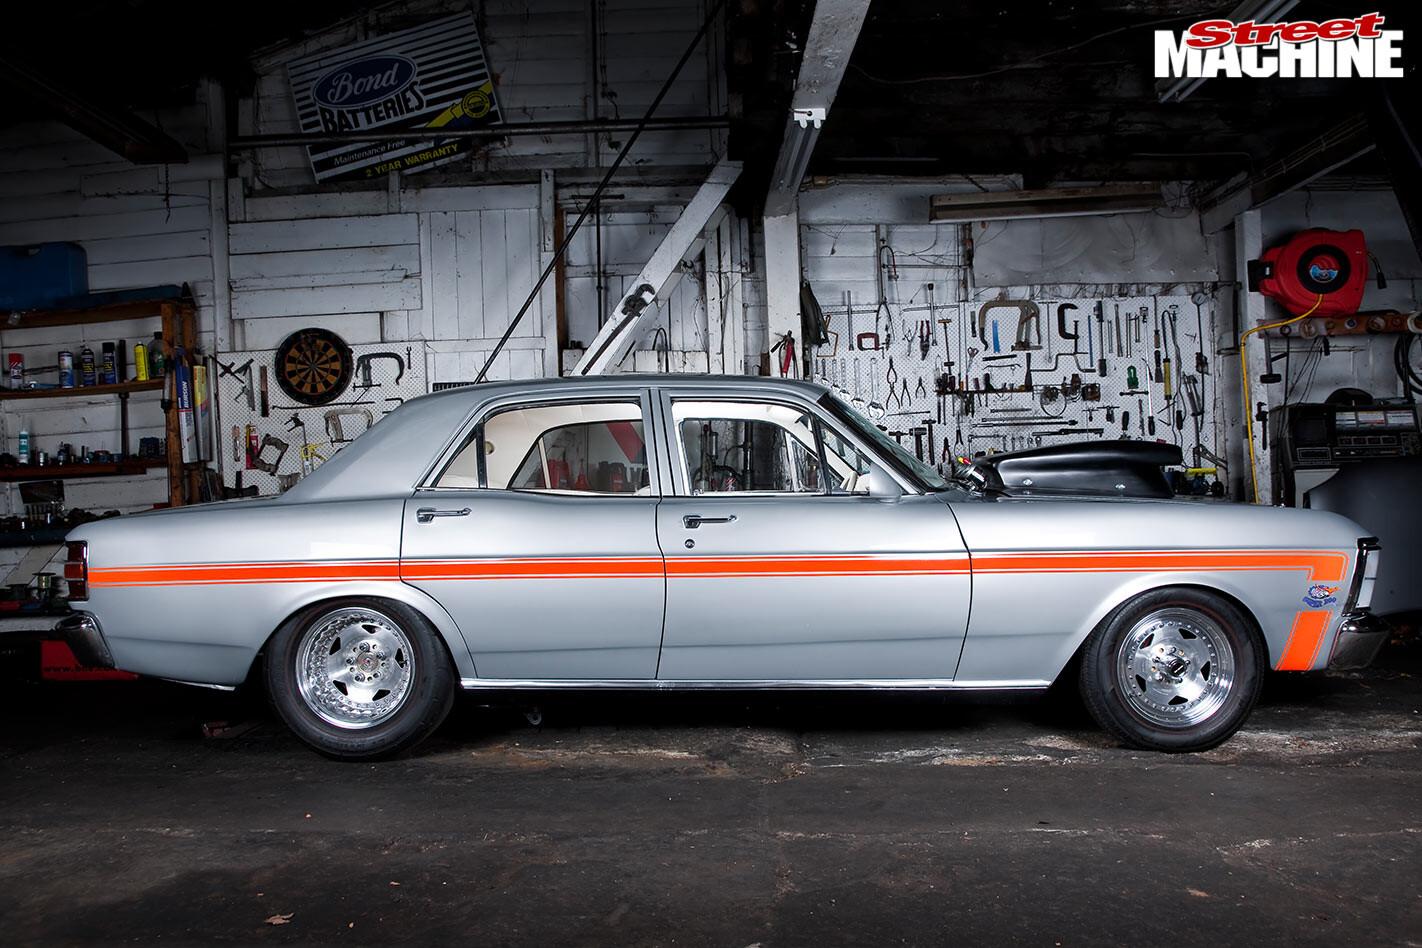 Ford Falcon XW side